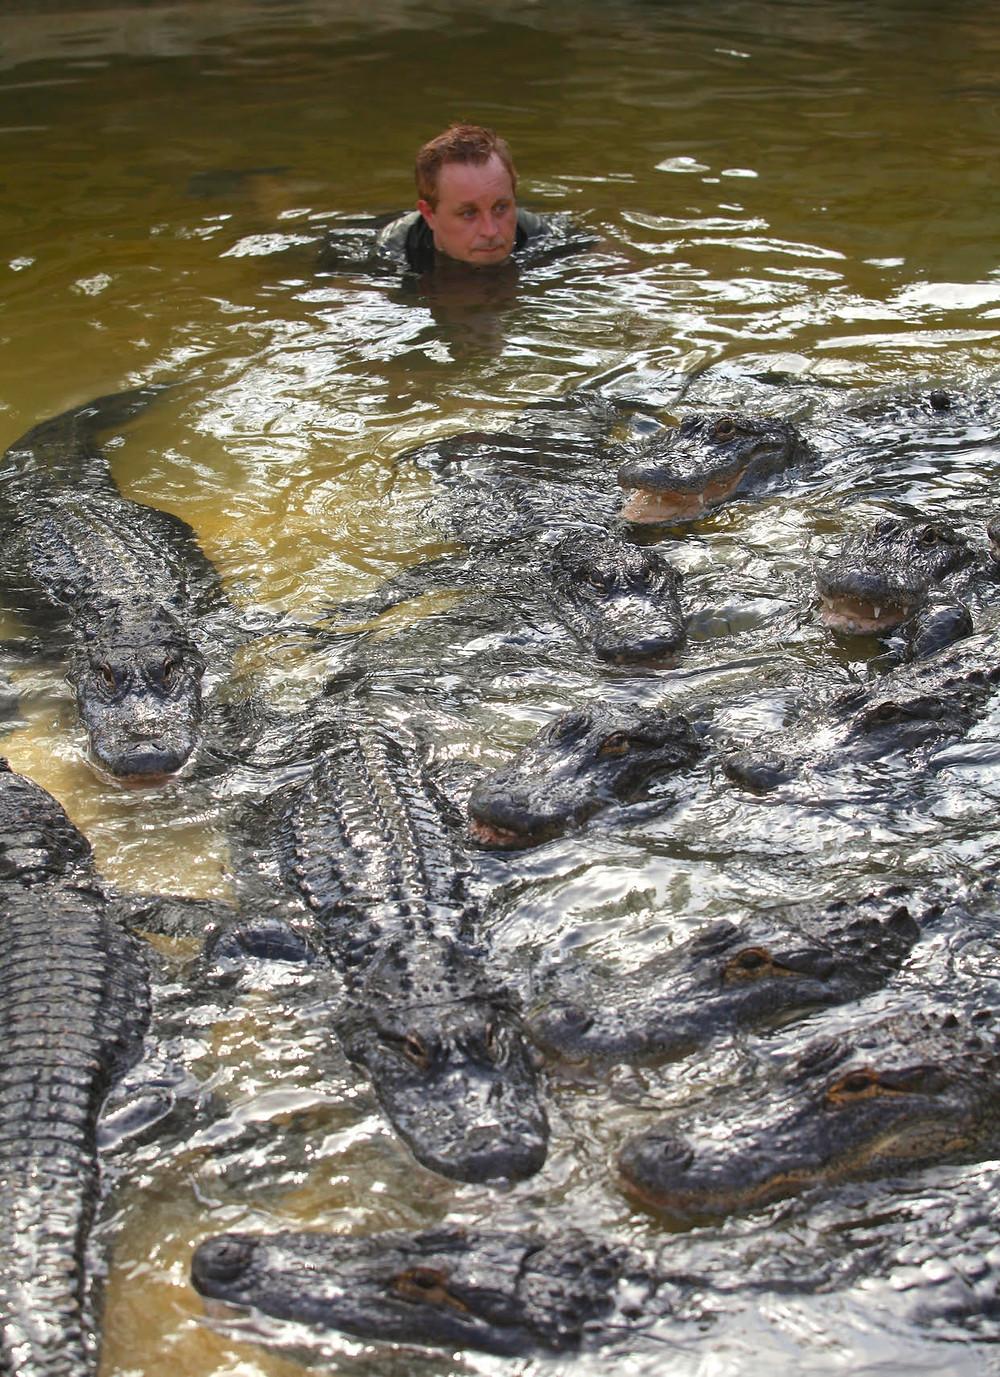 Gator Crusader Swimming with his gators